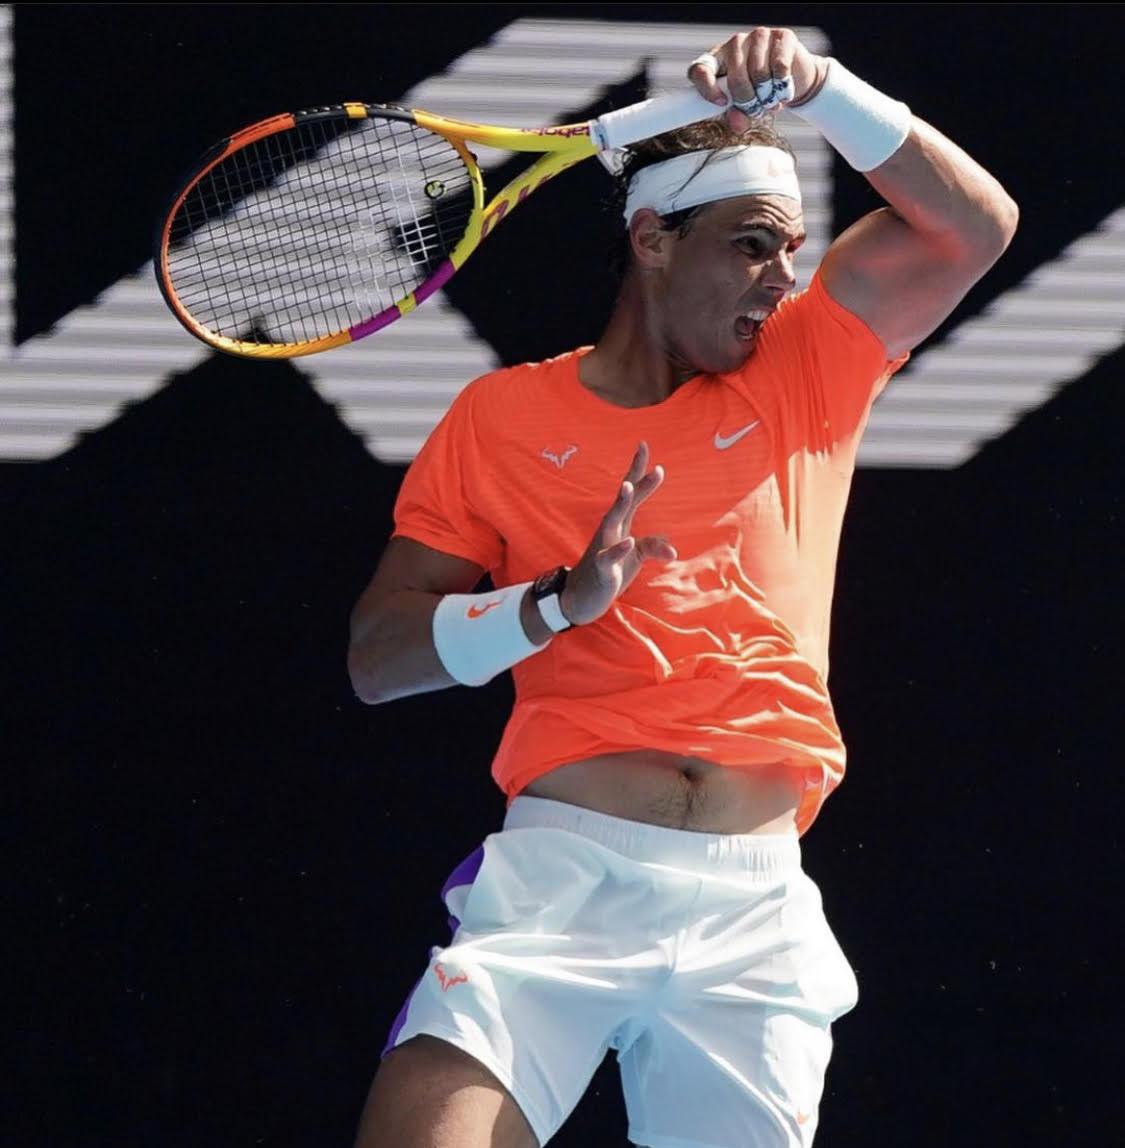 Rafa Nadal Academy USA - Rafa Nadal Academy Experience